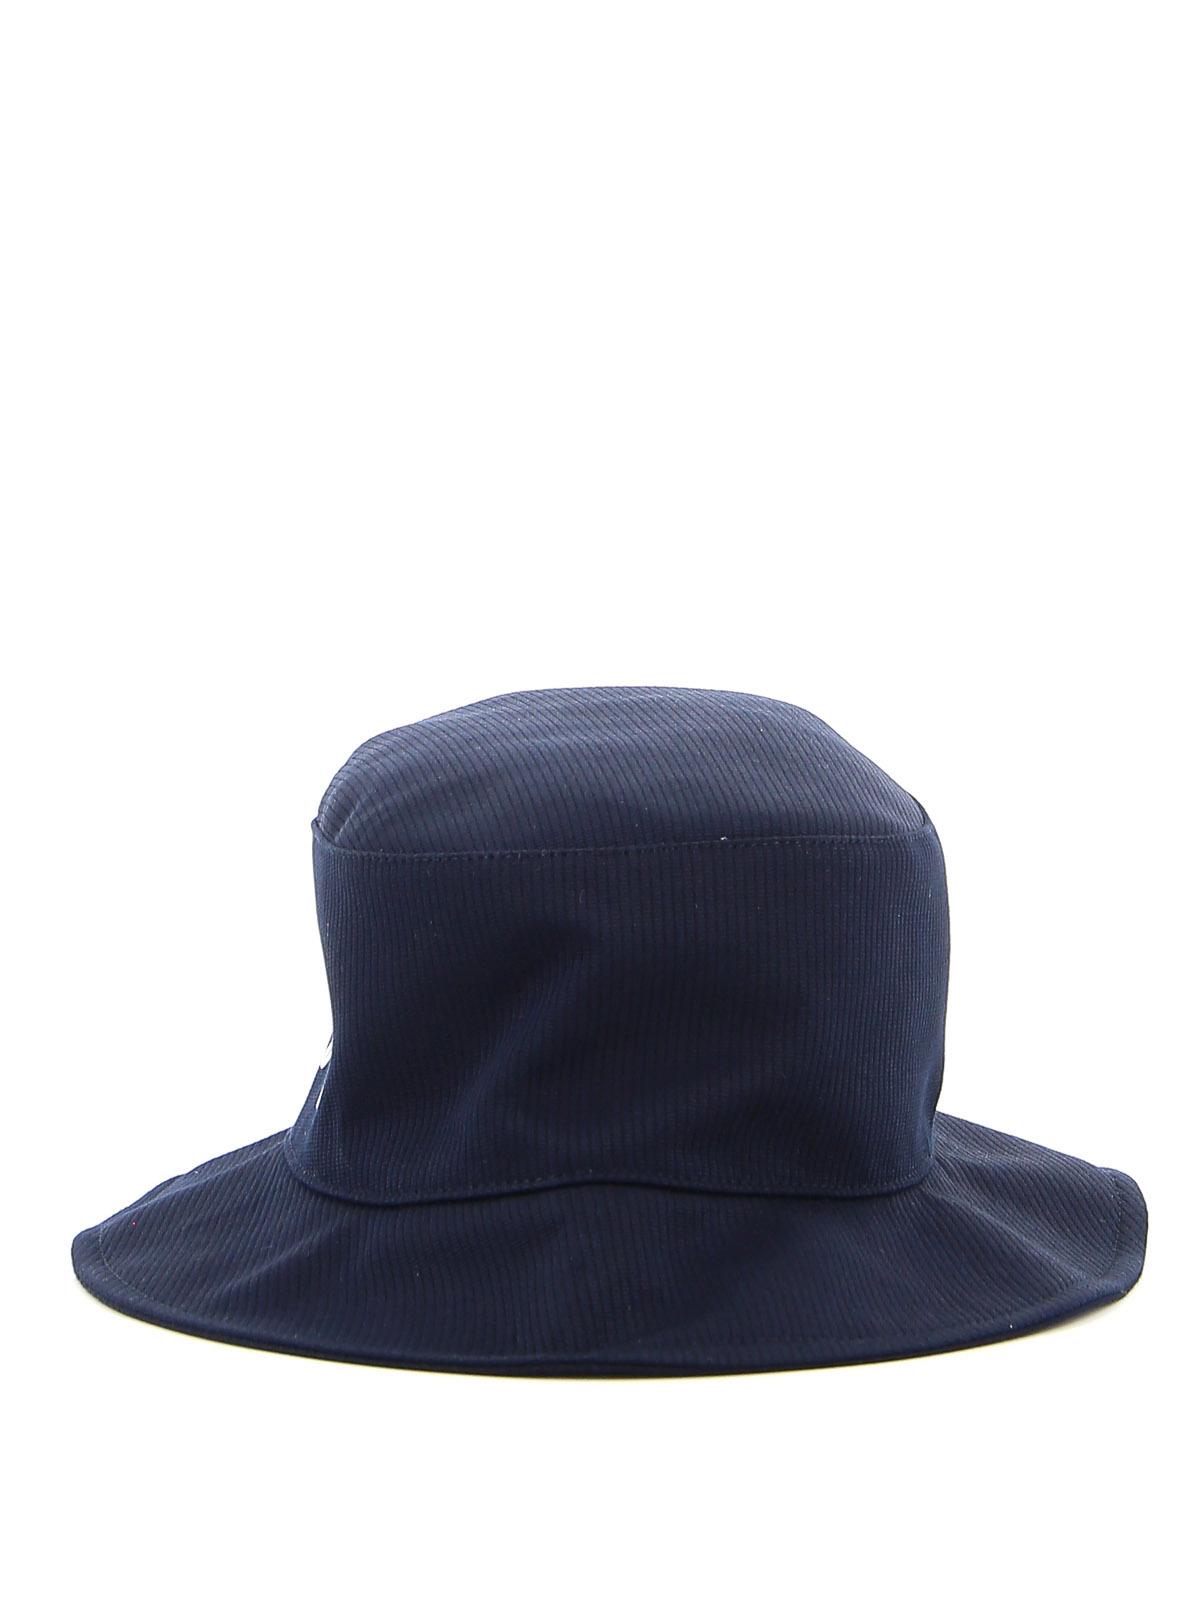 A.p.c. LOGO PRINT BUCKLET HAT